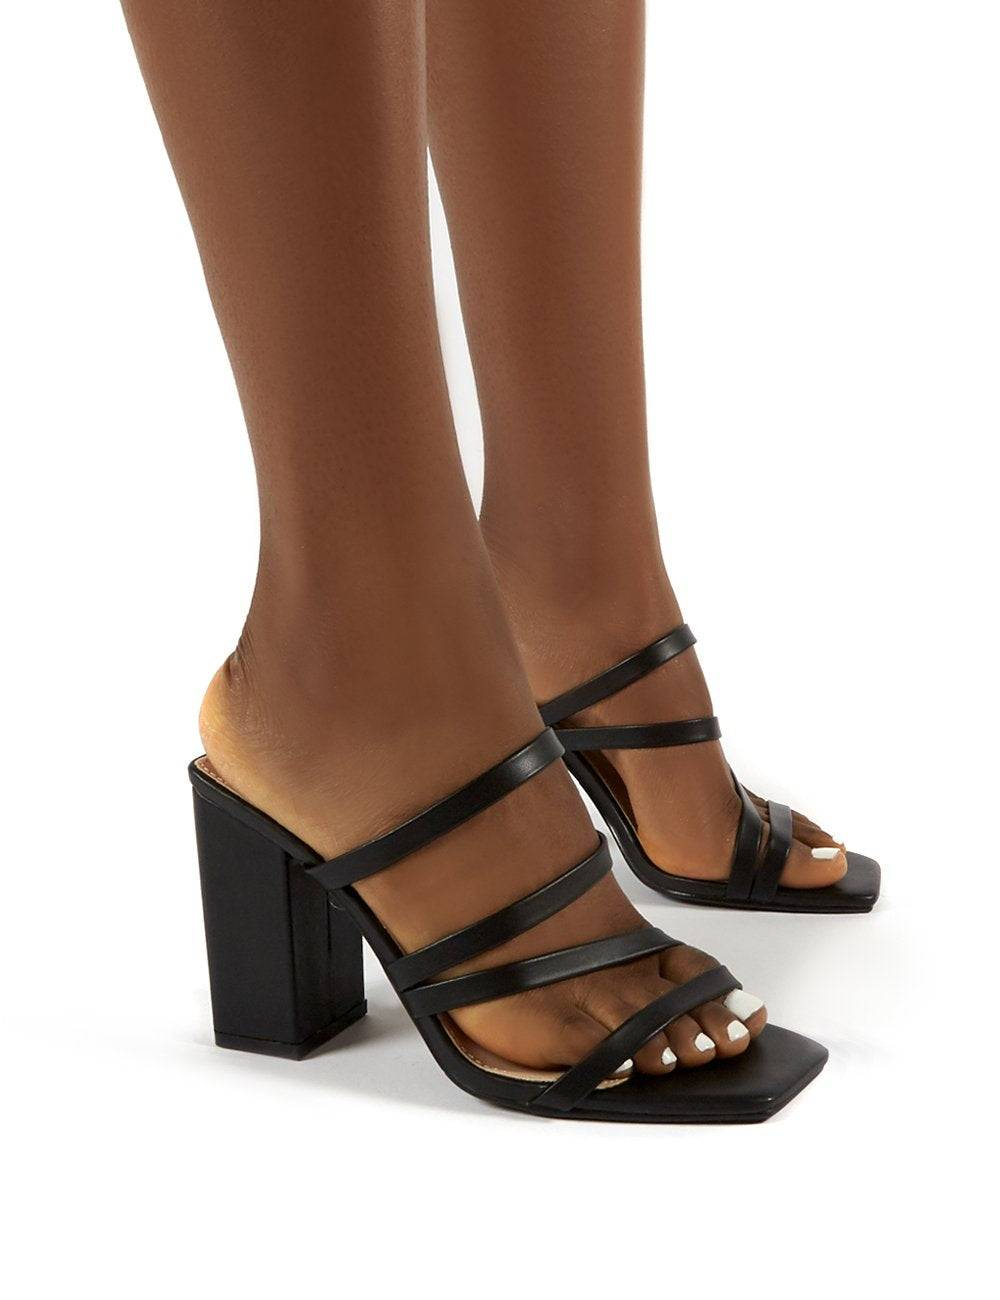 Public Desire US Kalia Wide Fit Black Block Heel Strappy Mules - US 6